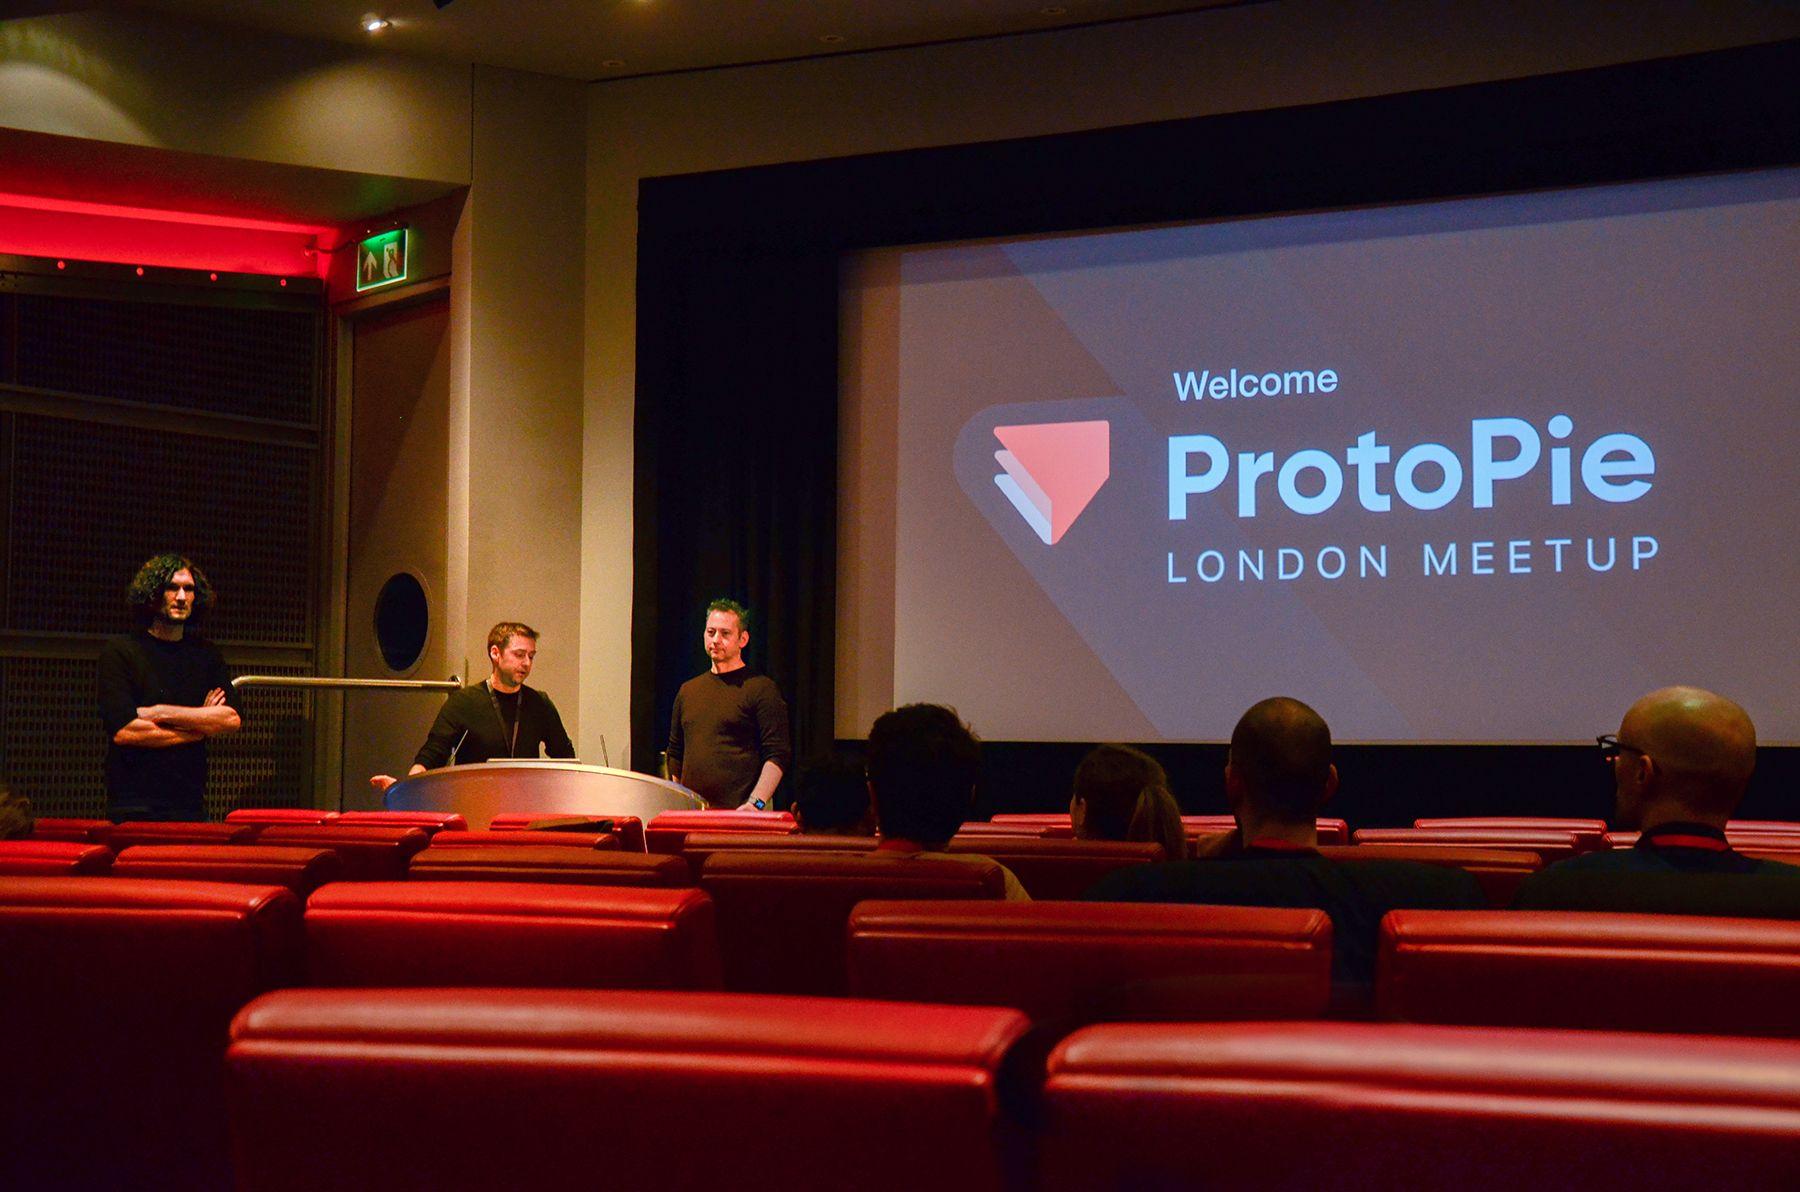 ProtoPie London meetup